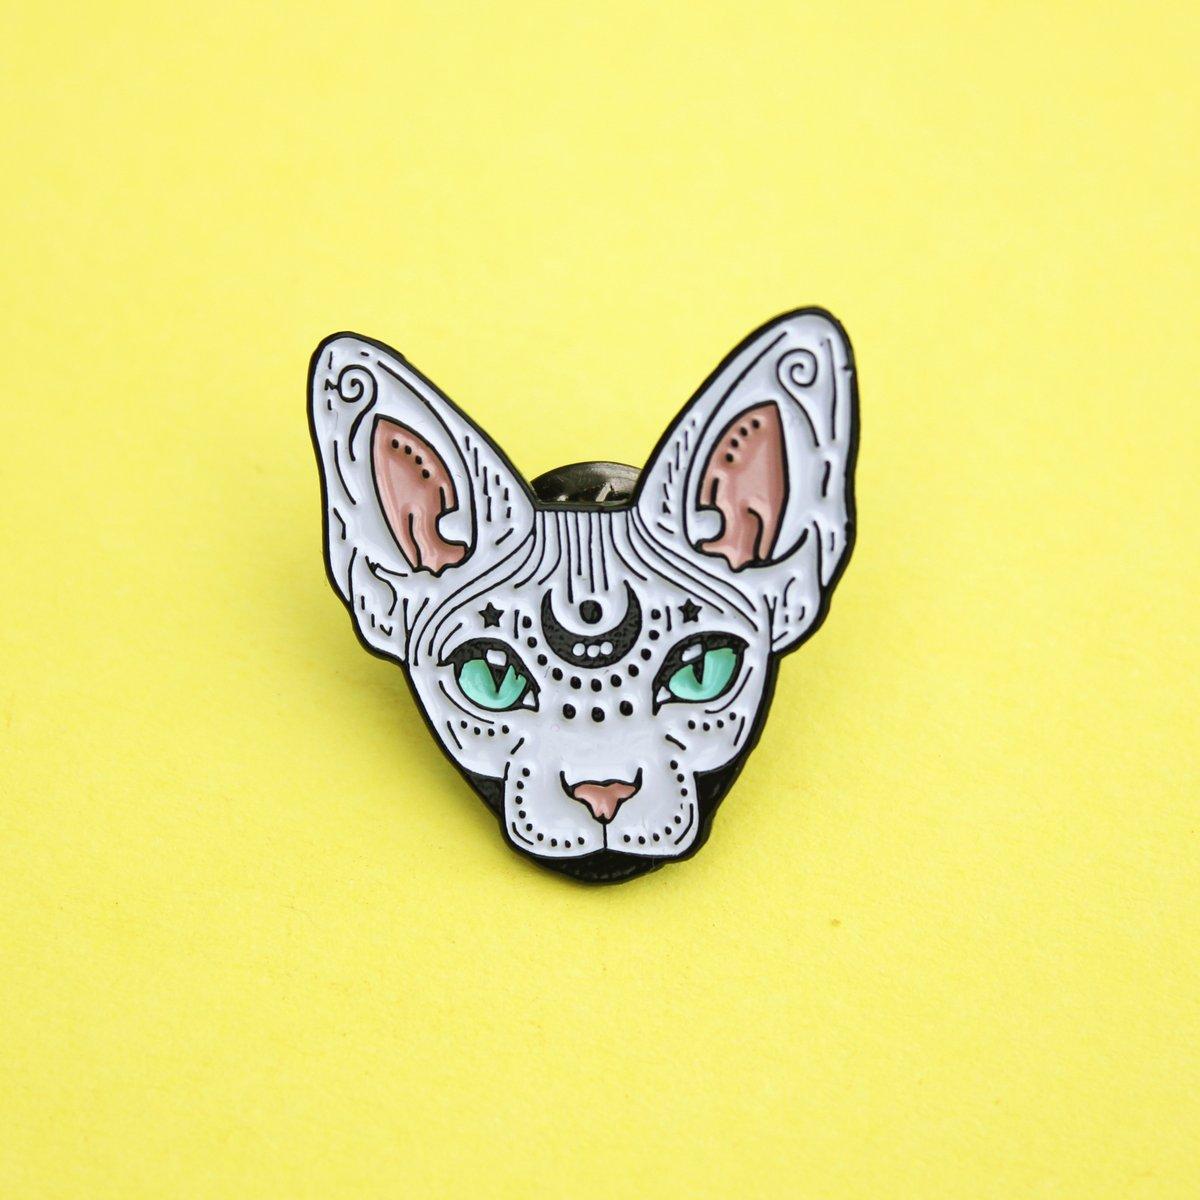 Image of Mystical Sphynx cat enamel pin, cat pin - badge - lapel pin